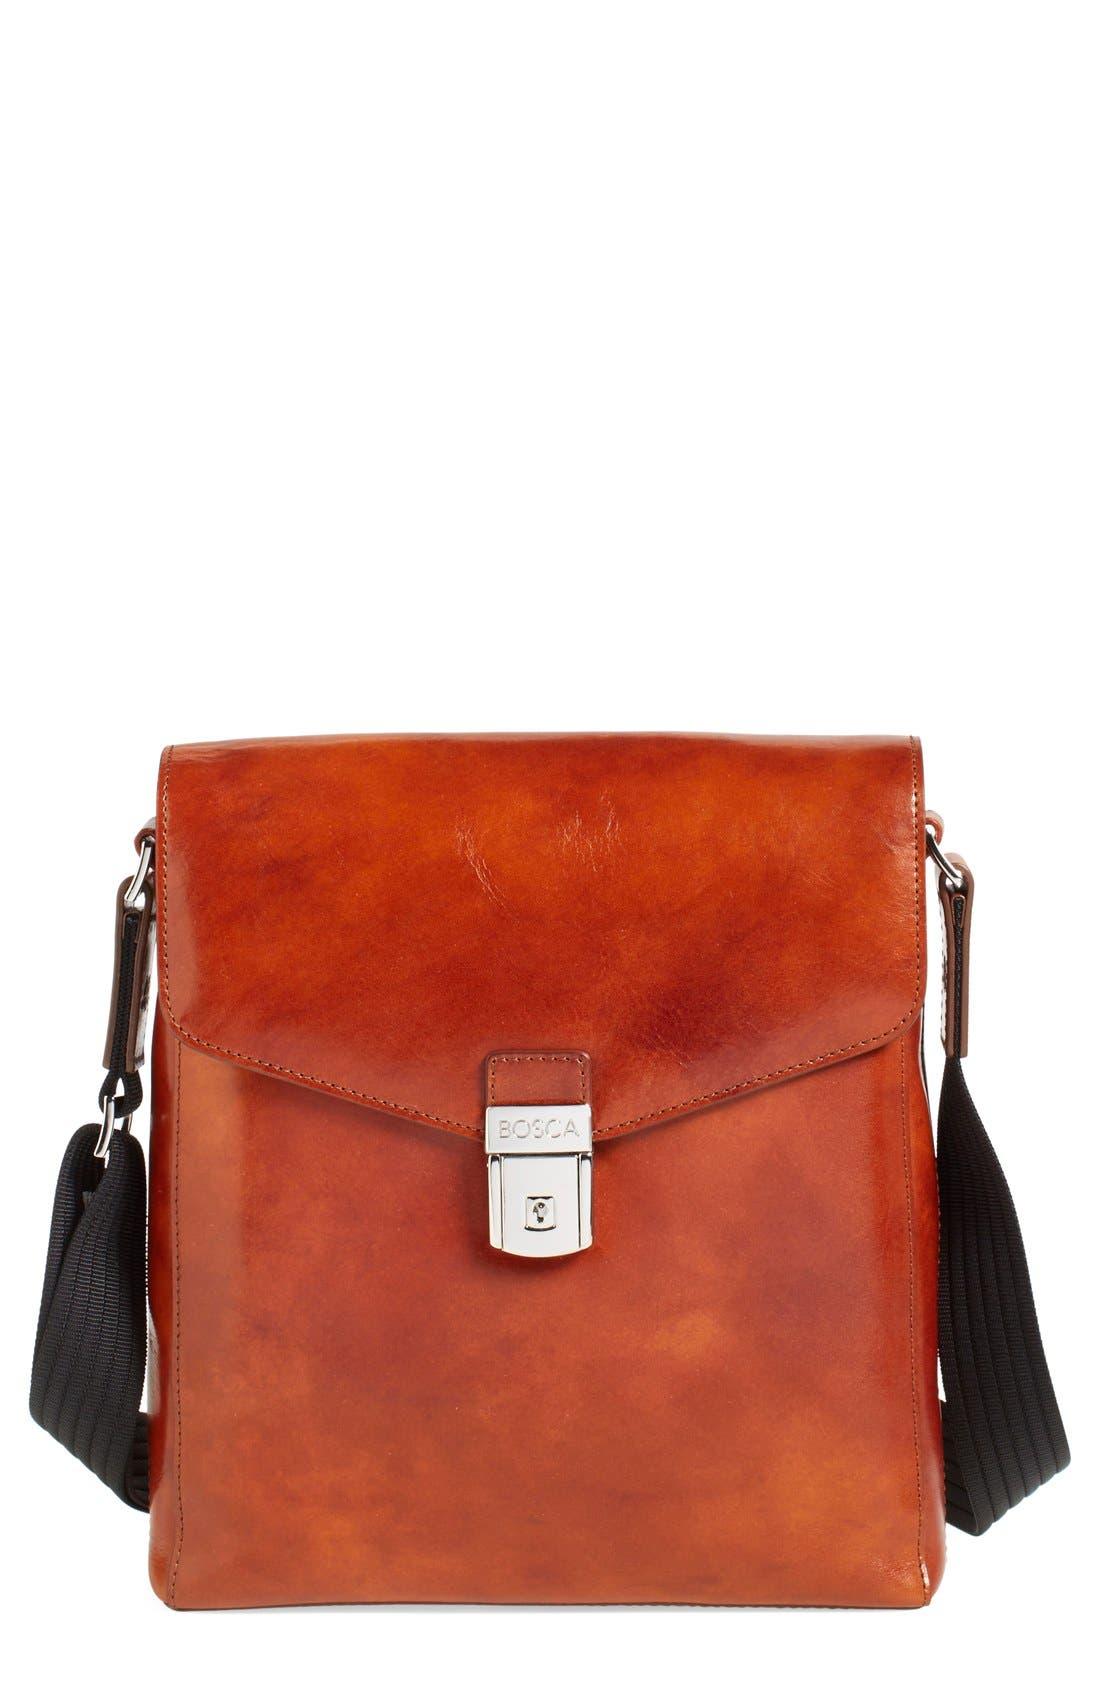 BOSCA Man Bag Leather Crossbody Bag